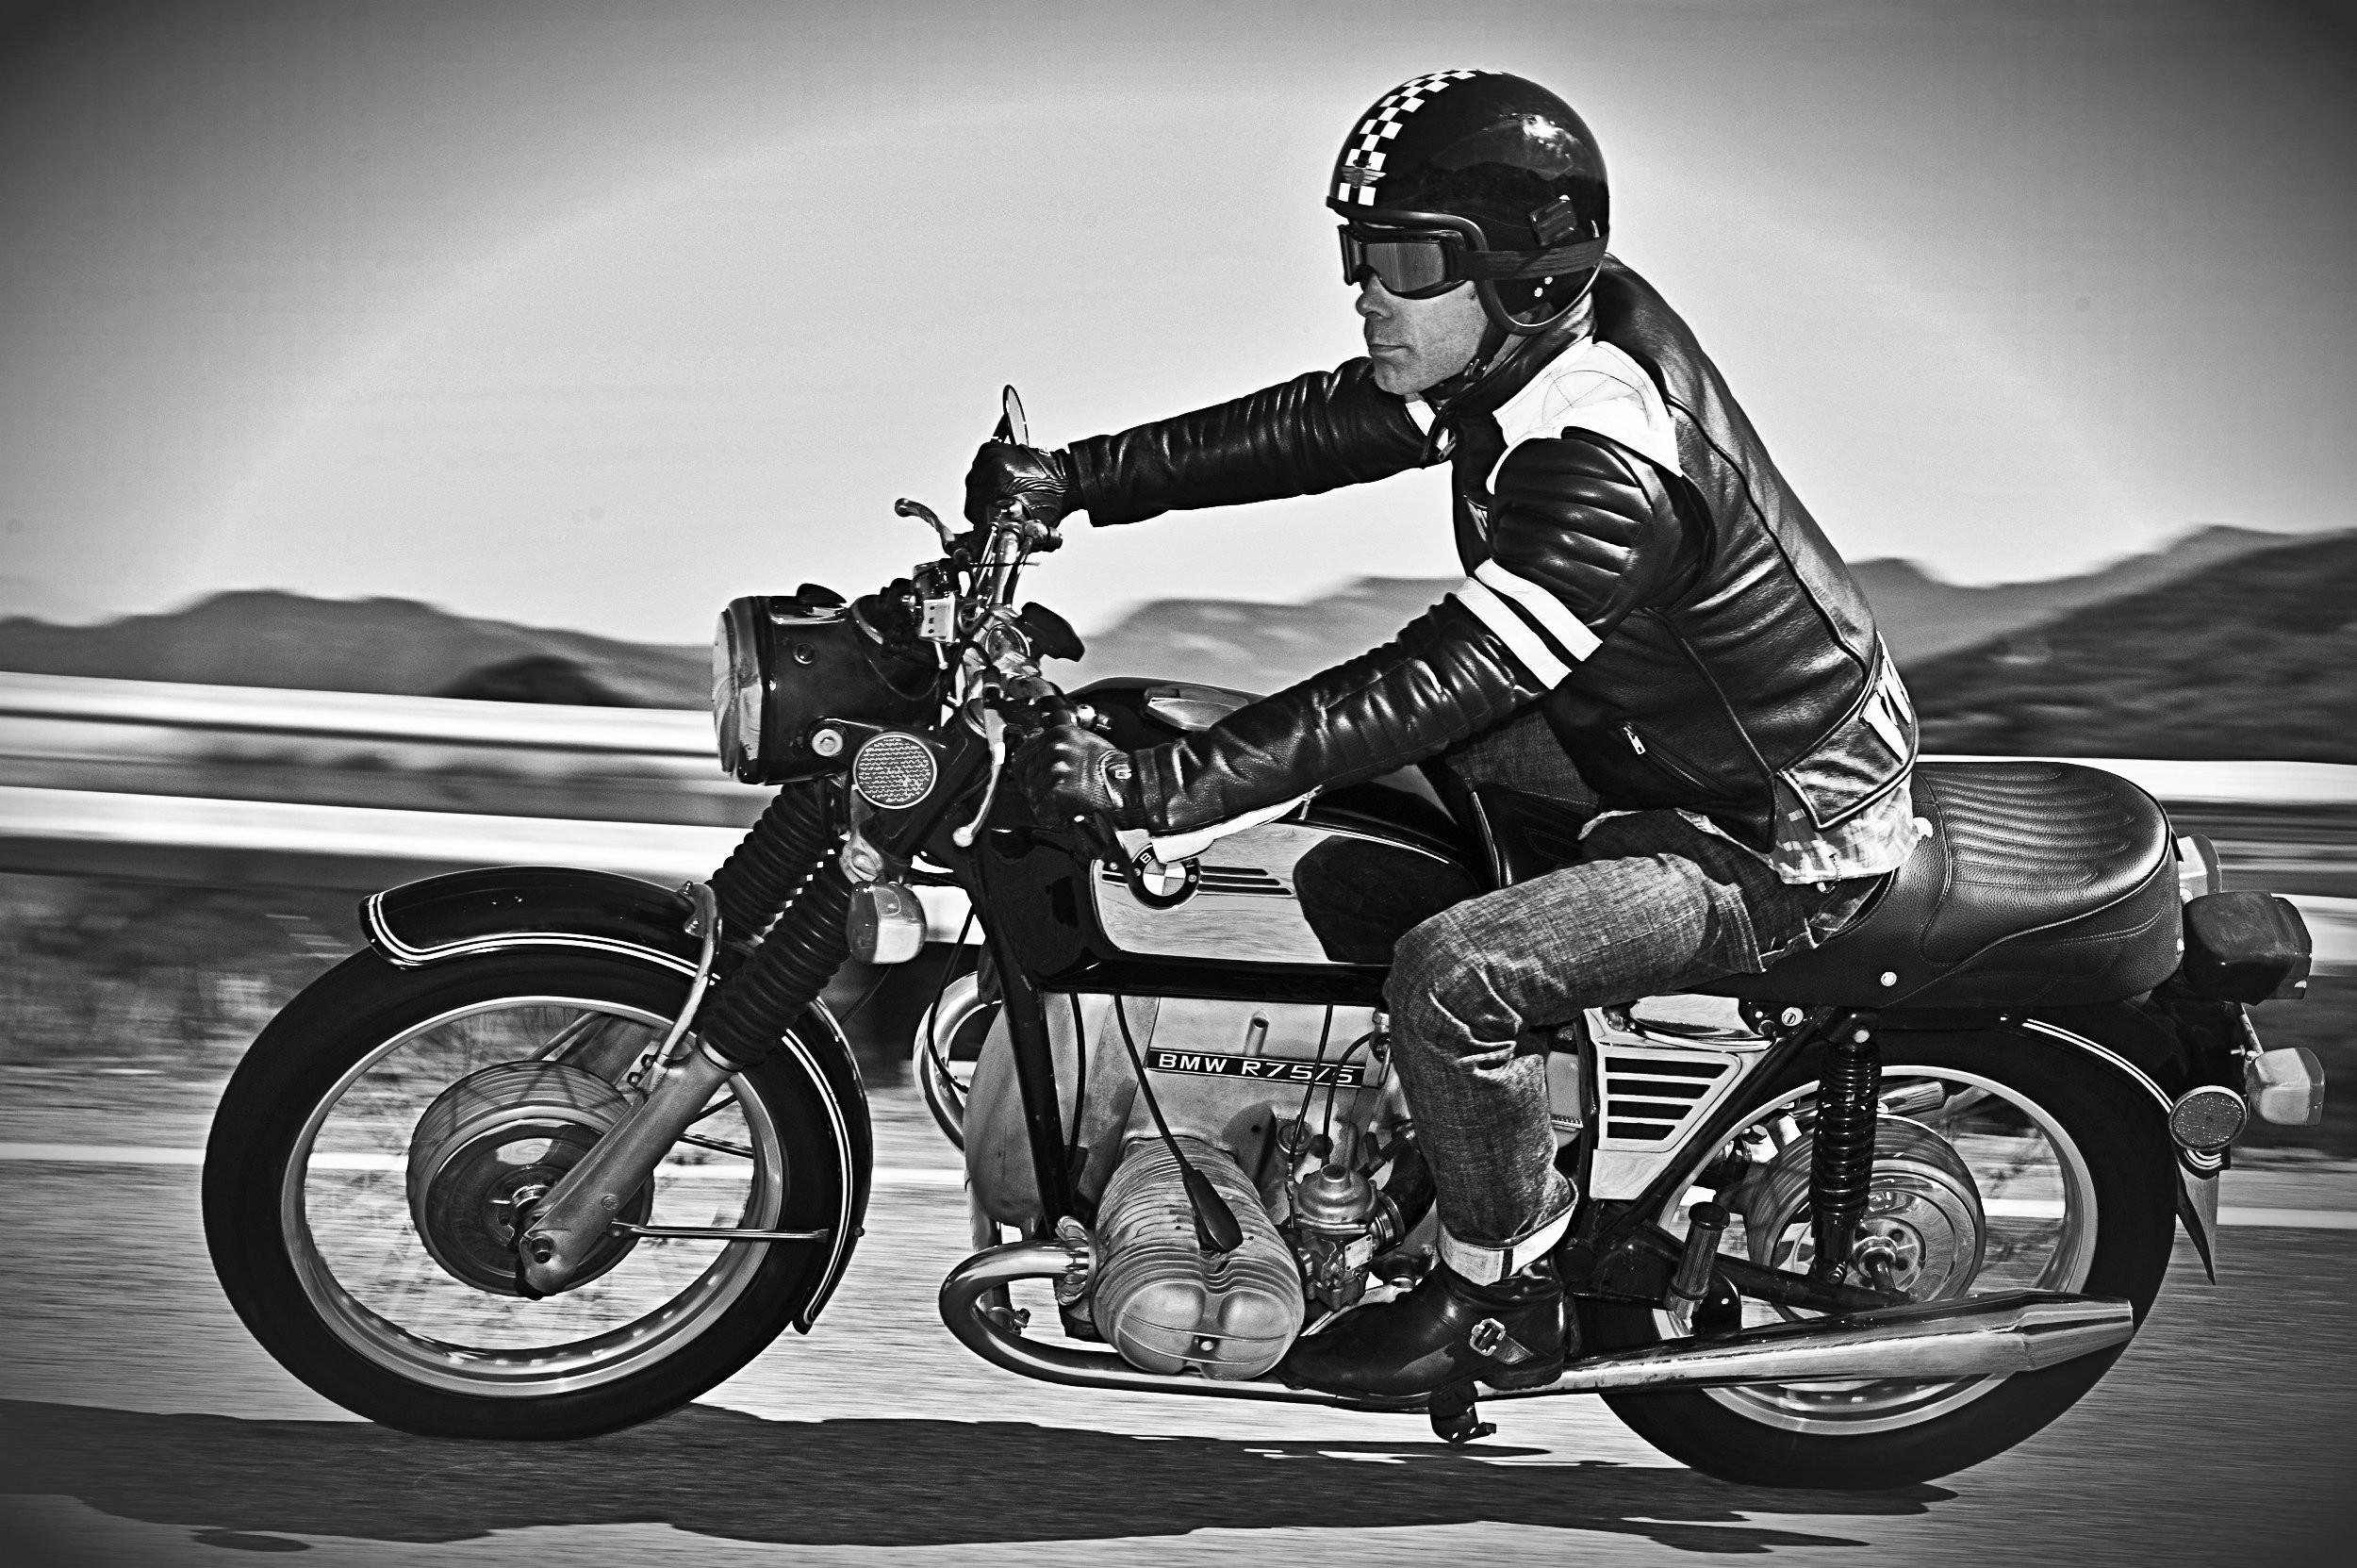 motorcycle classic racer cafe motorcycles bmw bike retro motorbike honda leather biker wallpapers motor jacket club quality desktop indian racers